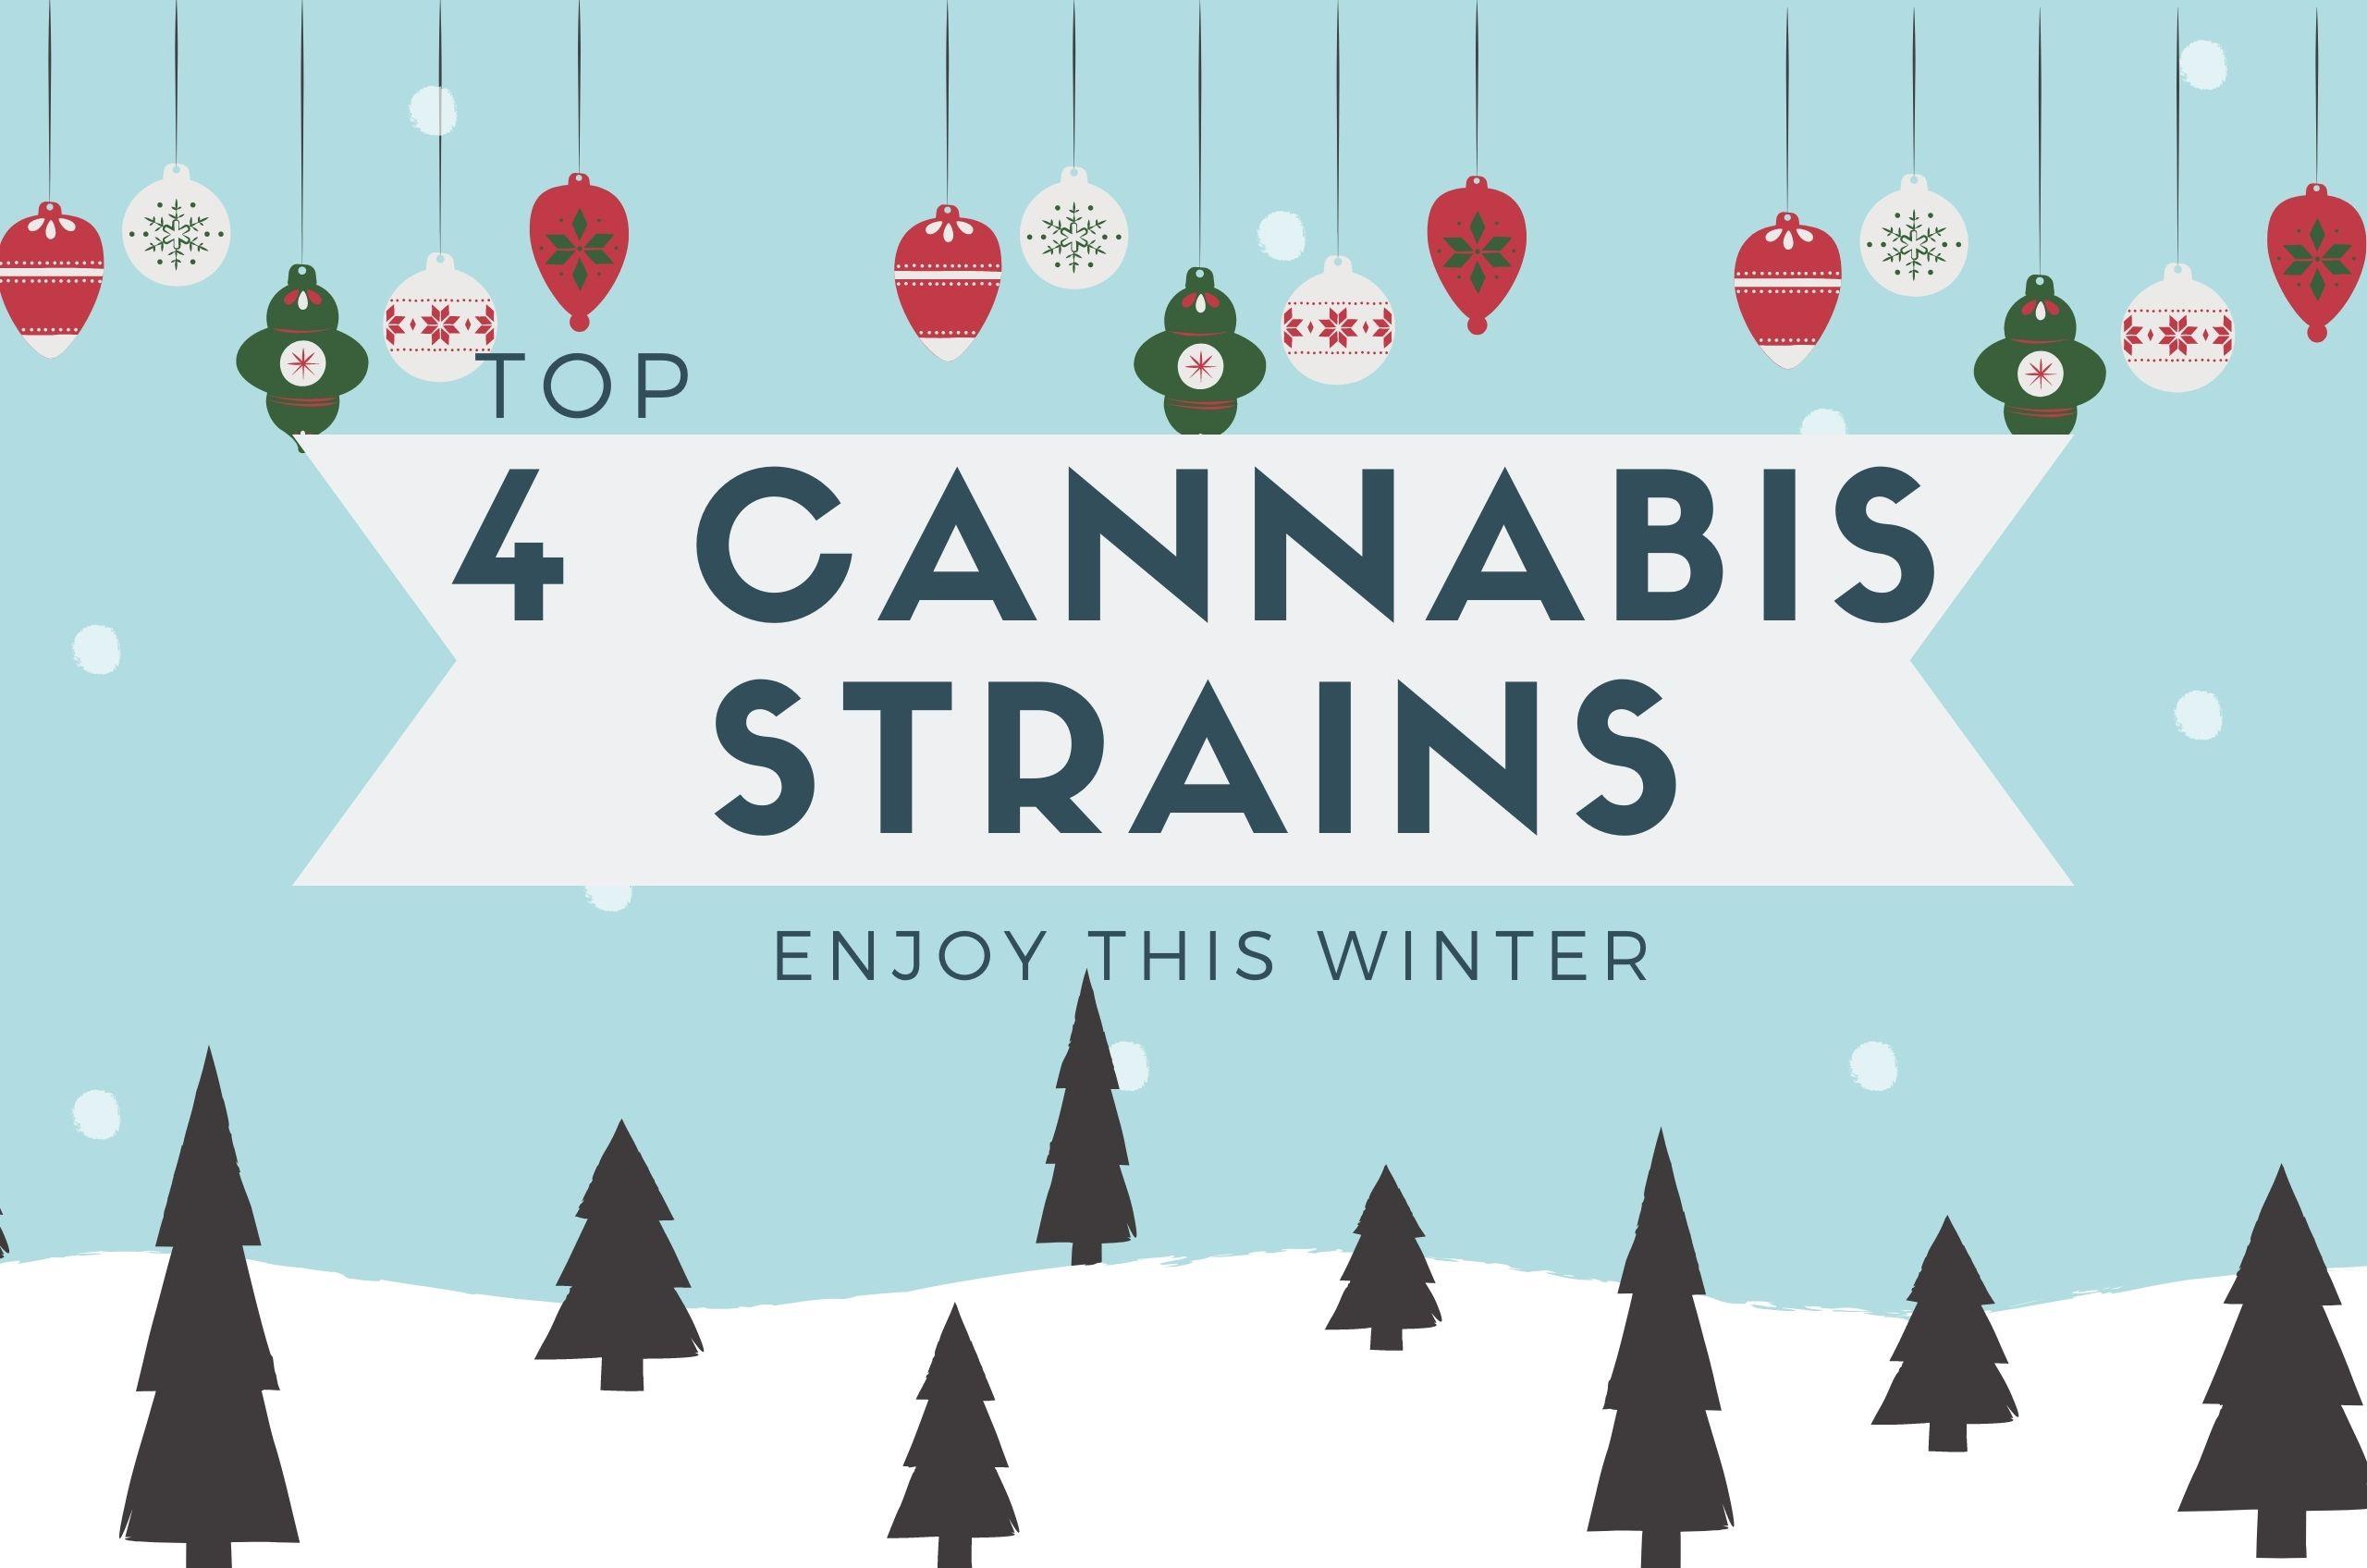 Top 4 Marijuana Strains to Enjoy This Christmas